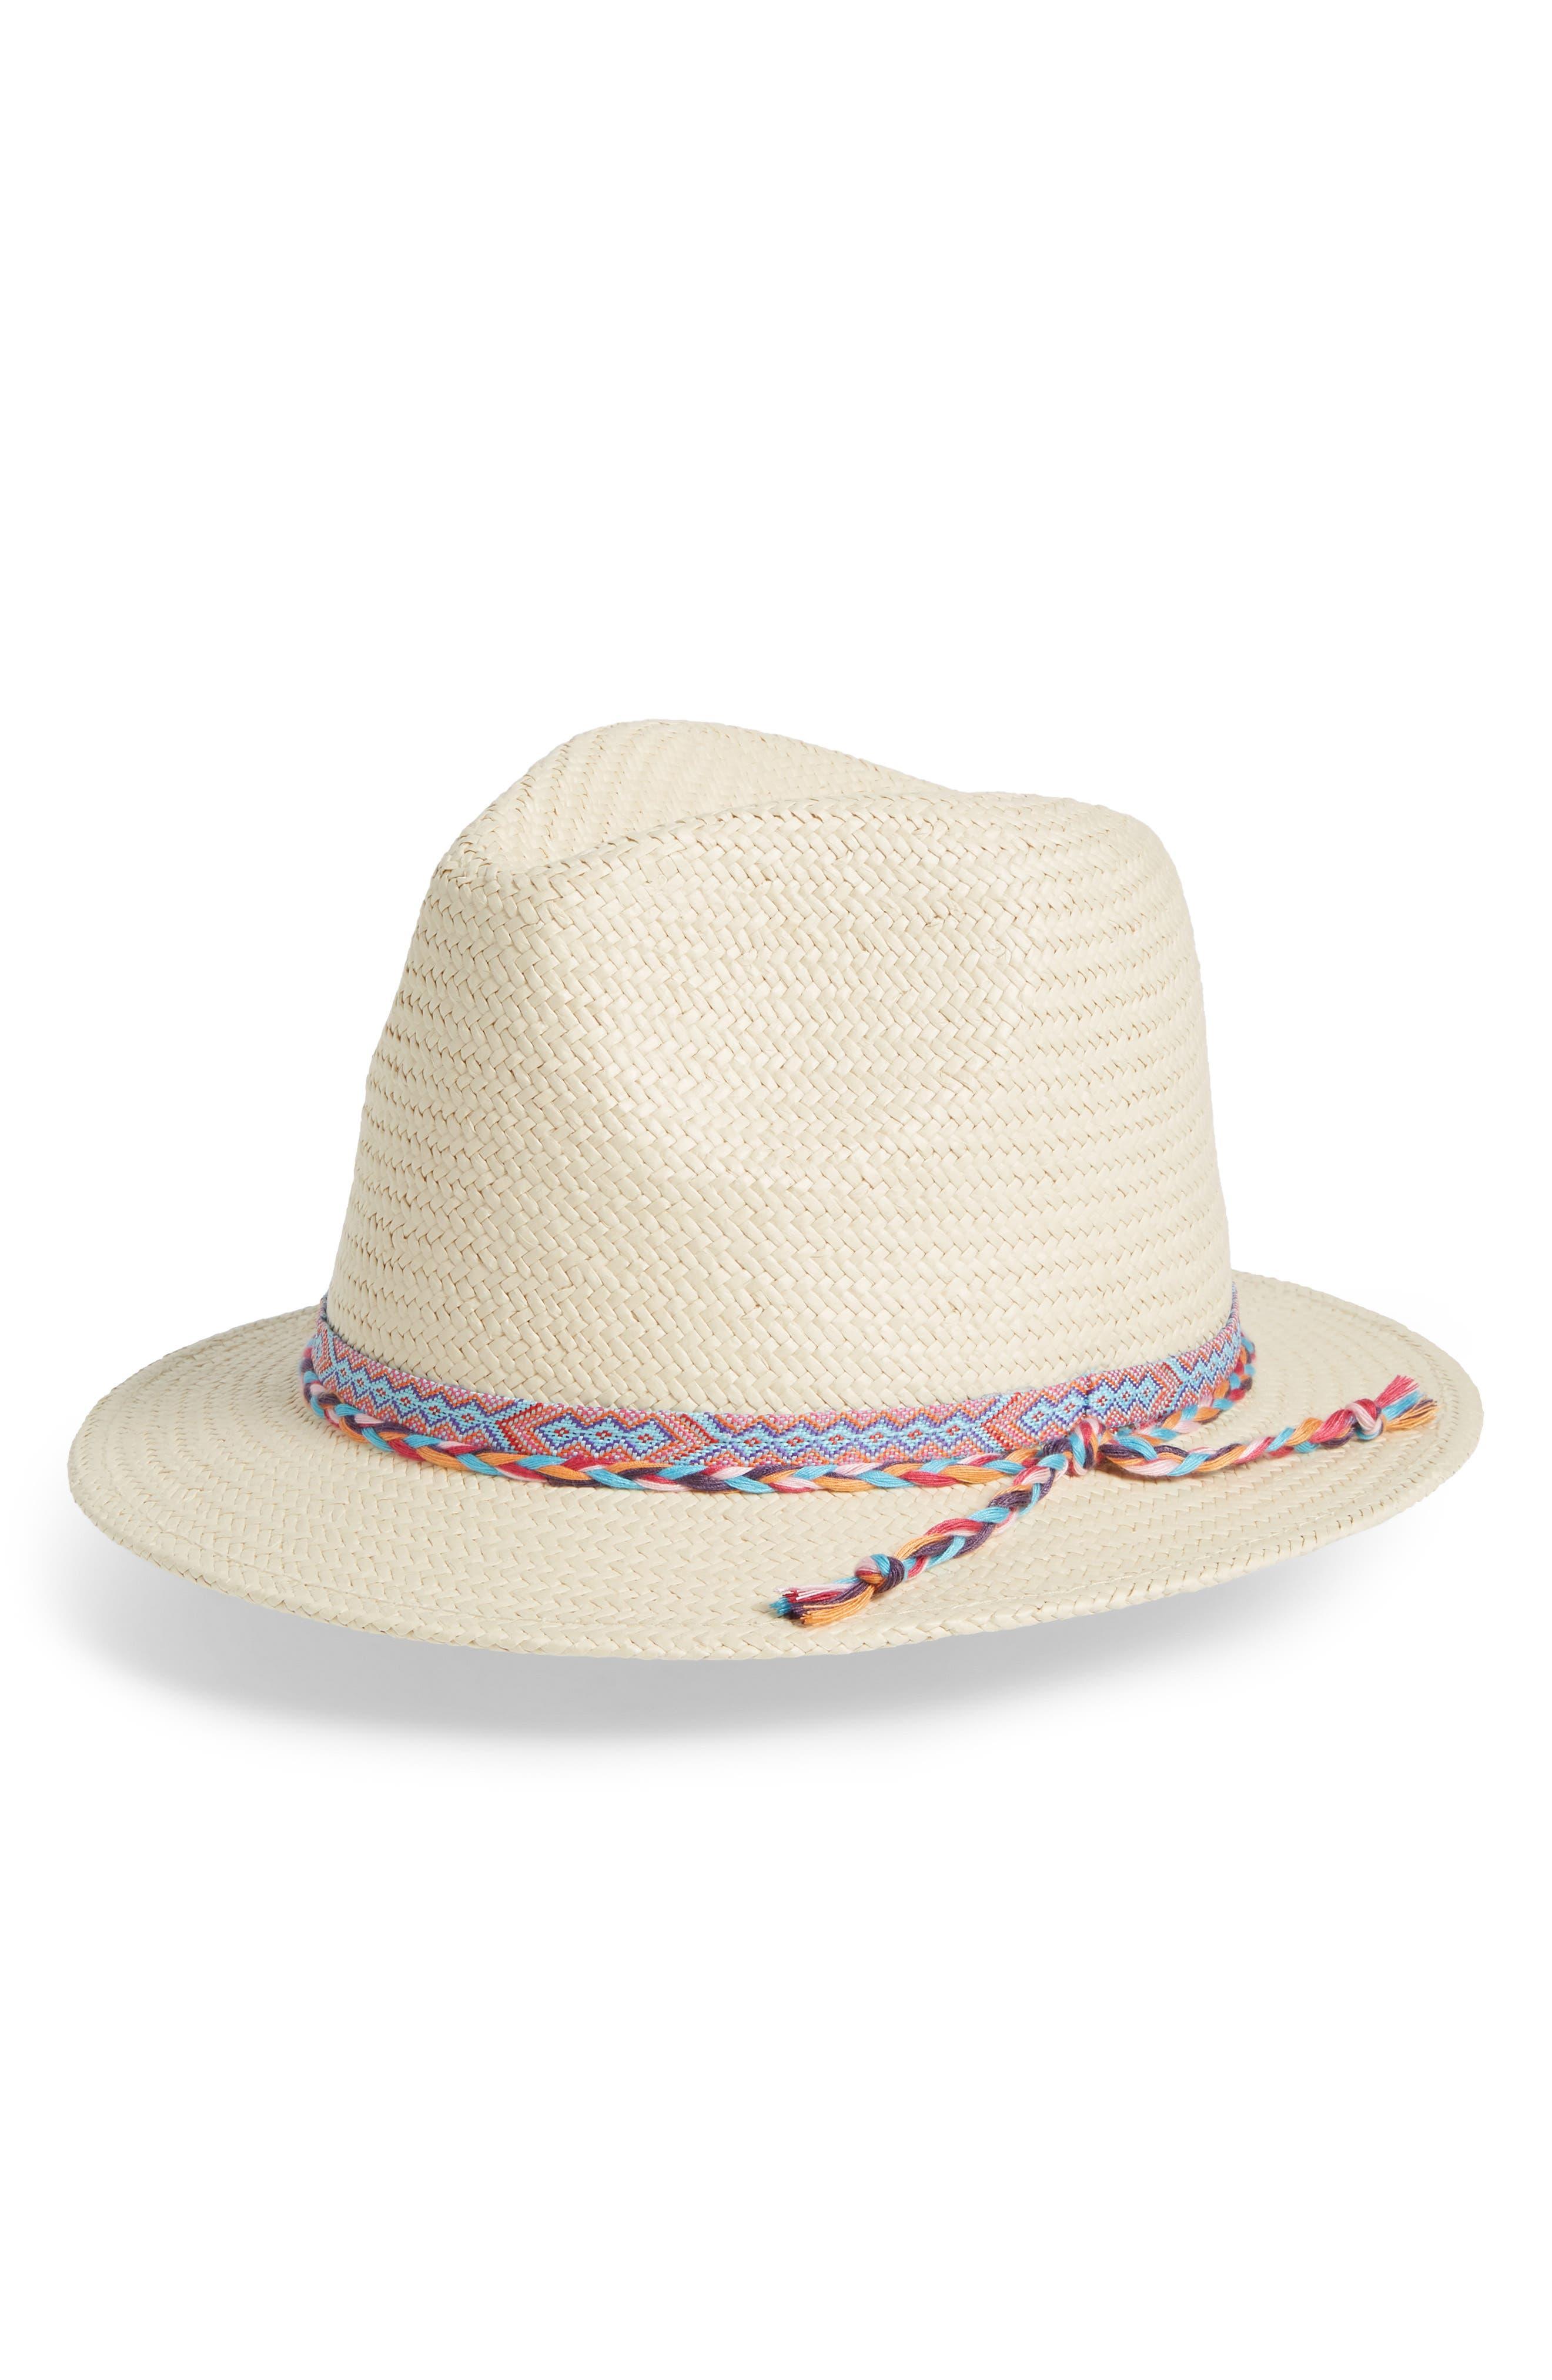 Braided Trim Panama Hat,                             Main thumbnail 1, color,                             235